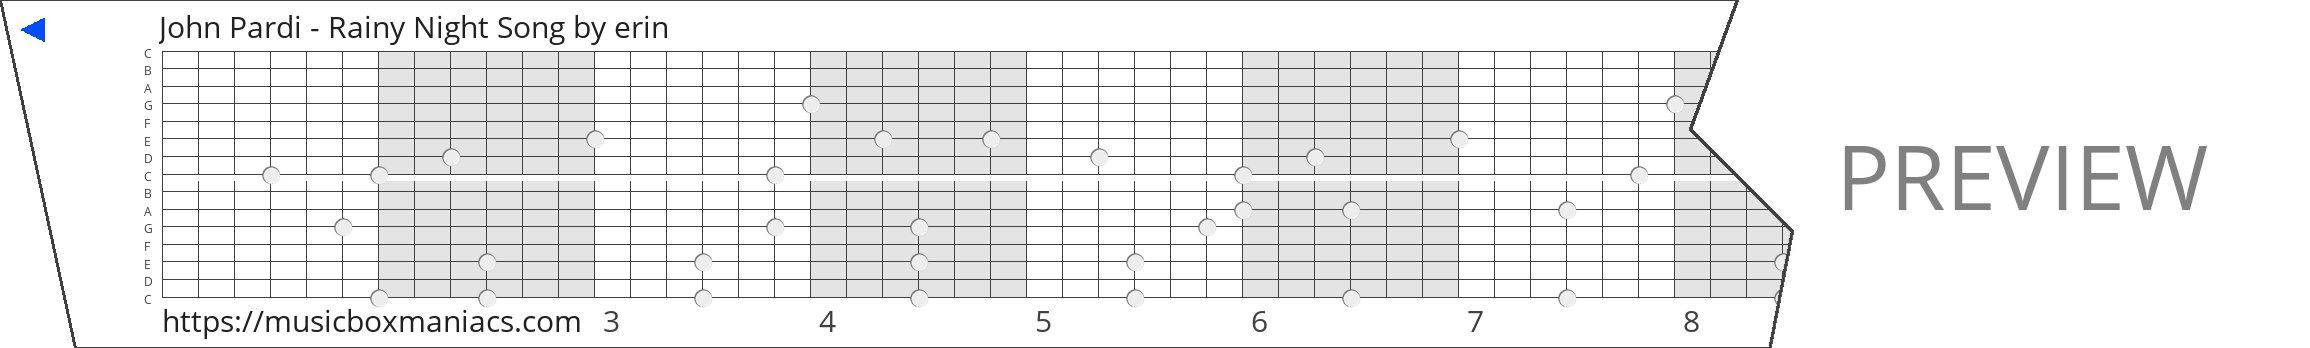 John Pardi - Rainy Night Song 15 note music box paper strip